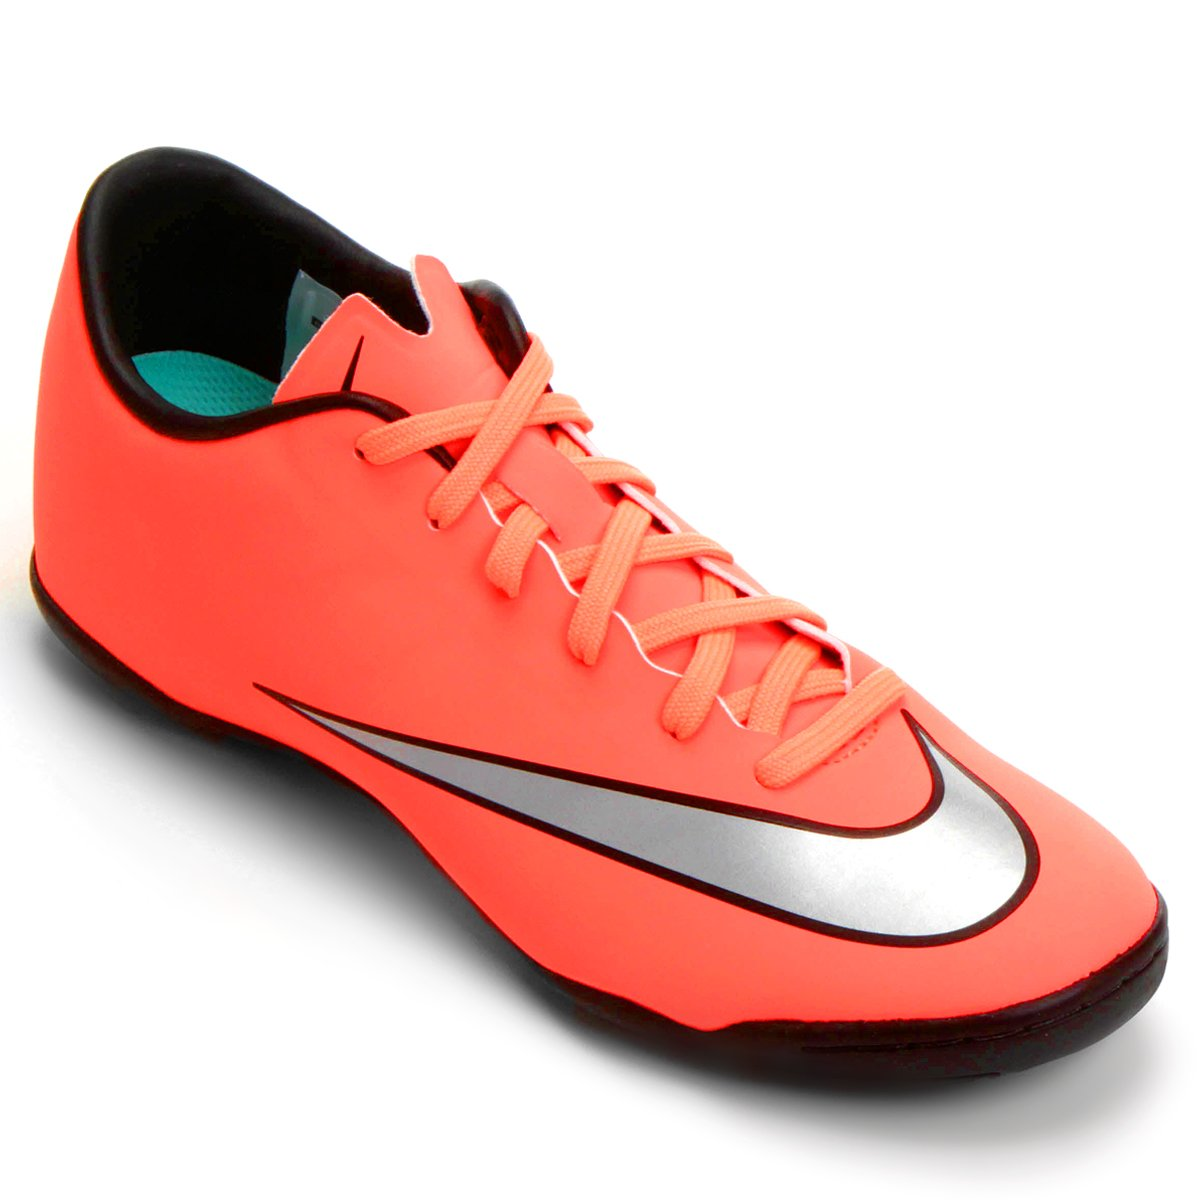 3b606b73aa Chuteira Futsal Nike Mercurial Victory 5 IC - Compre Agora